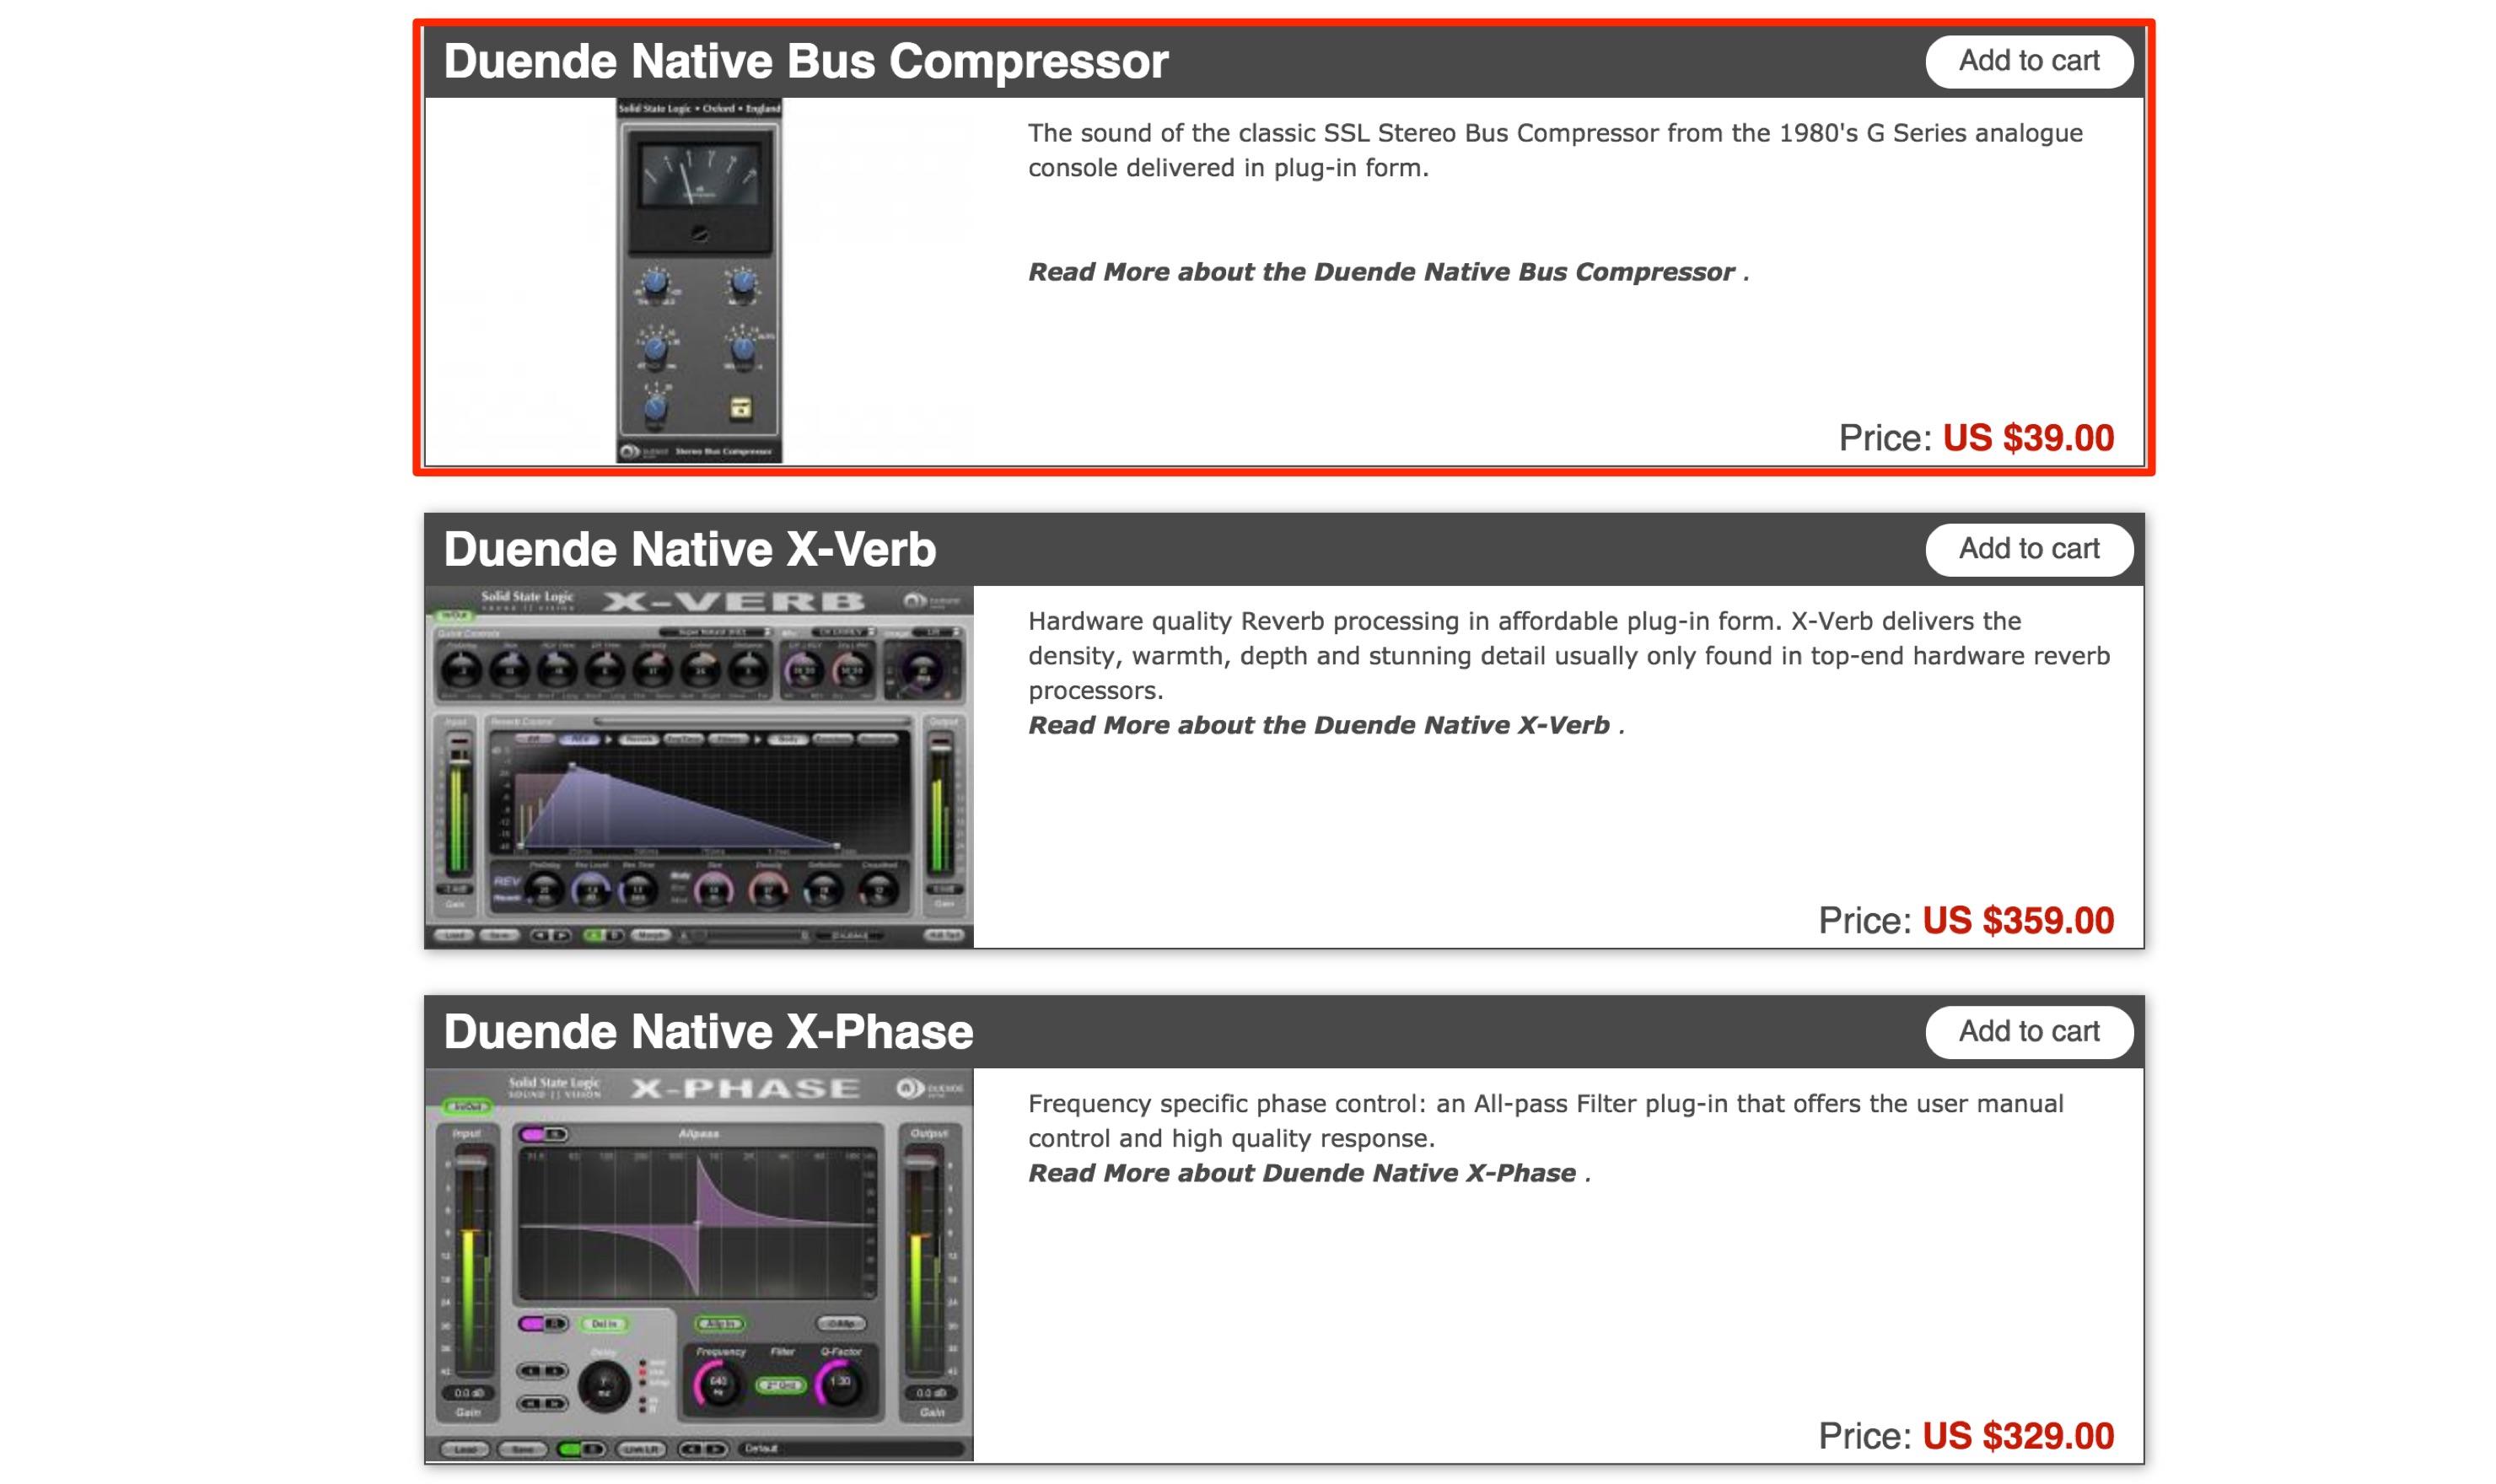 Duende Native Bus Compressor-1